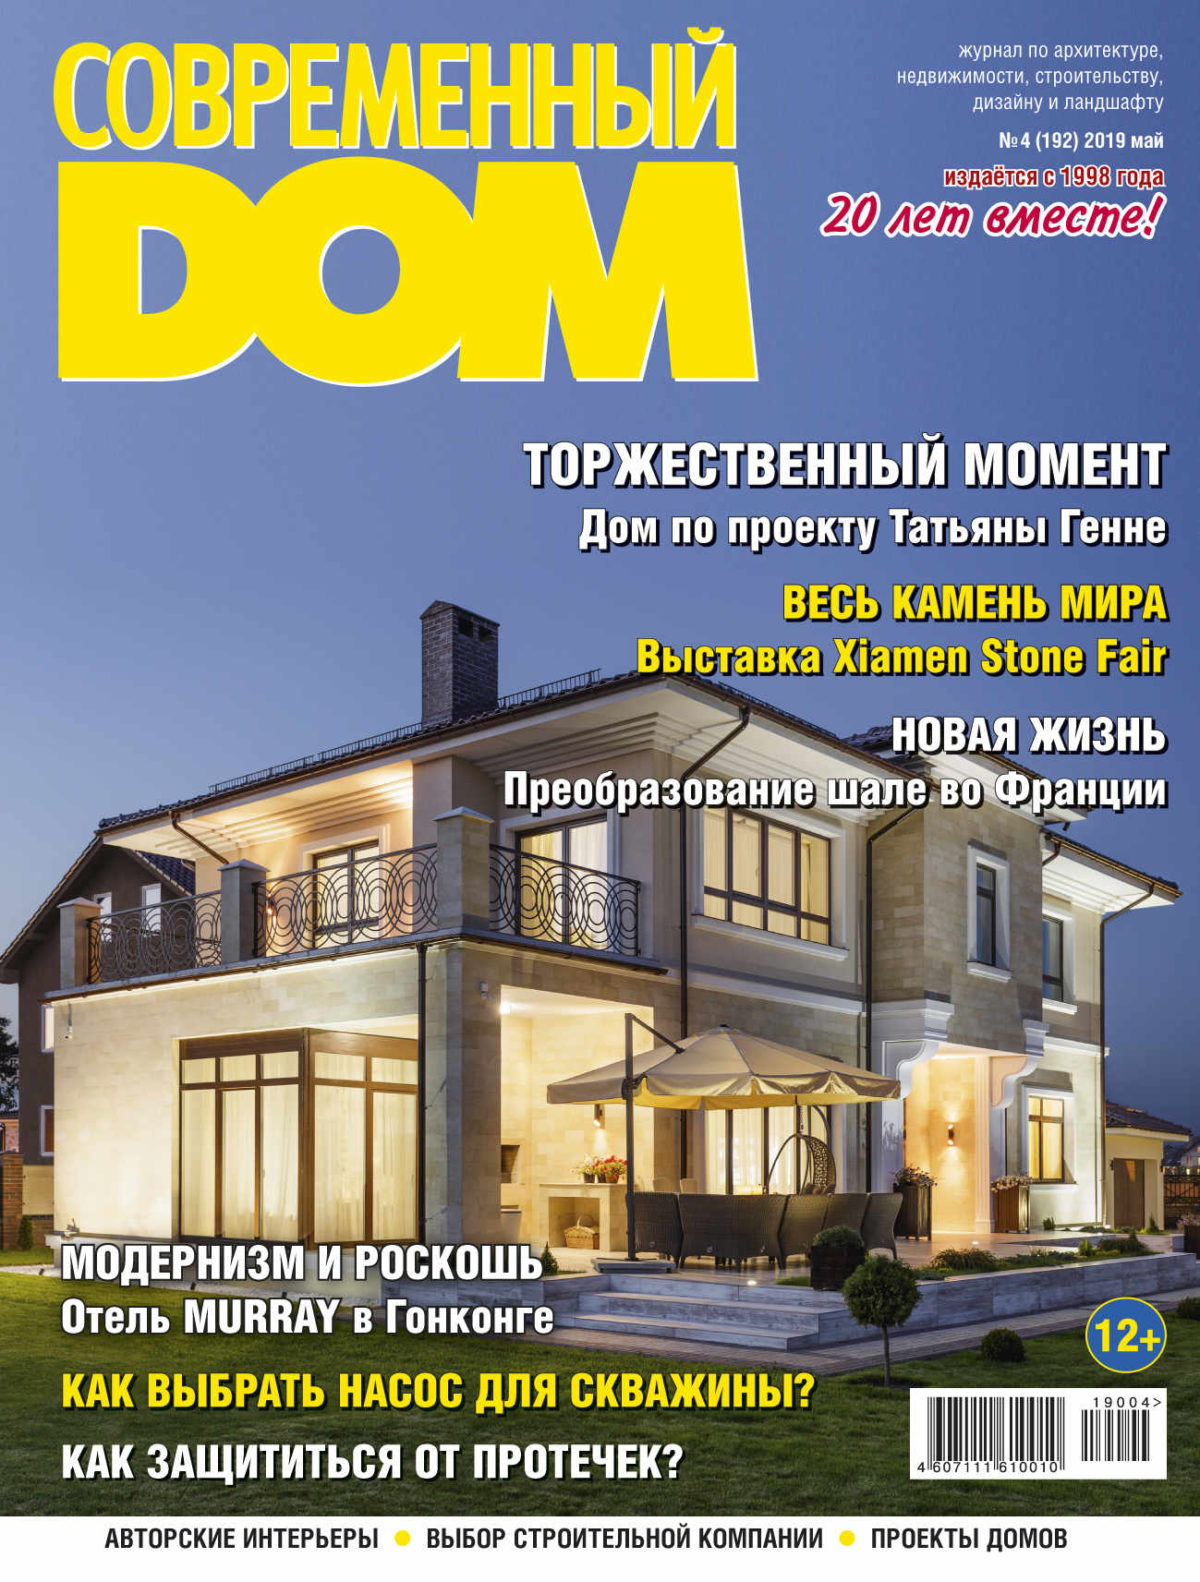 Cover-Modern-Home-4-2019-1200x1582.jpg